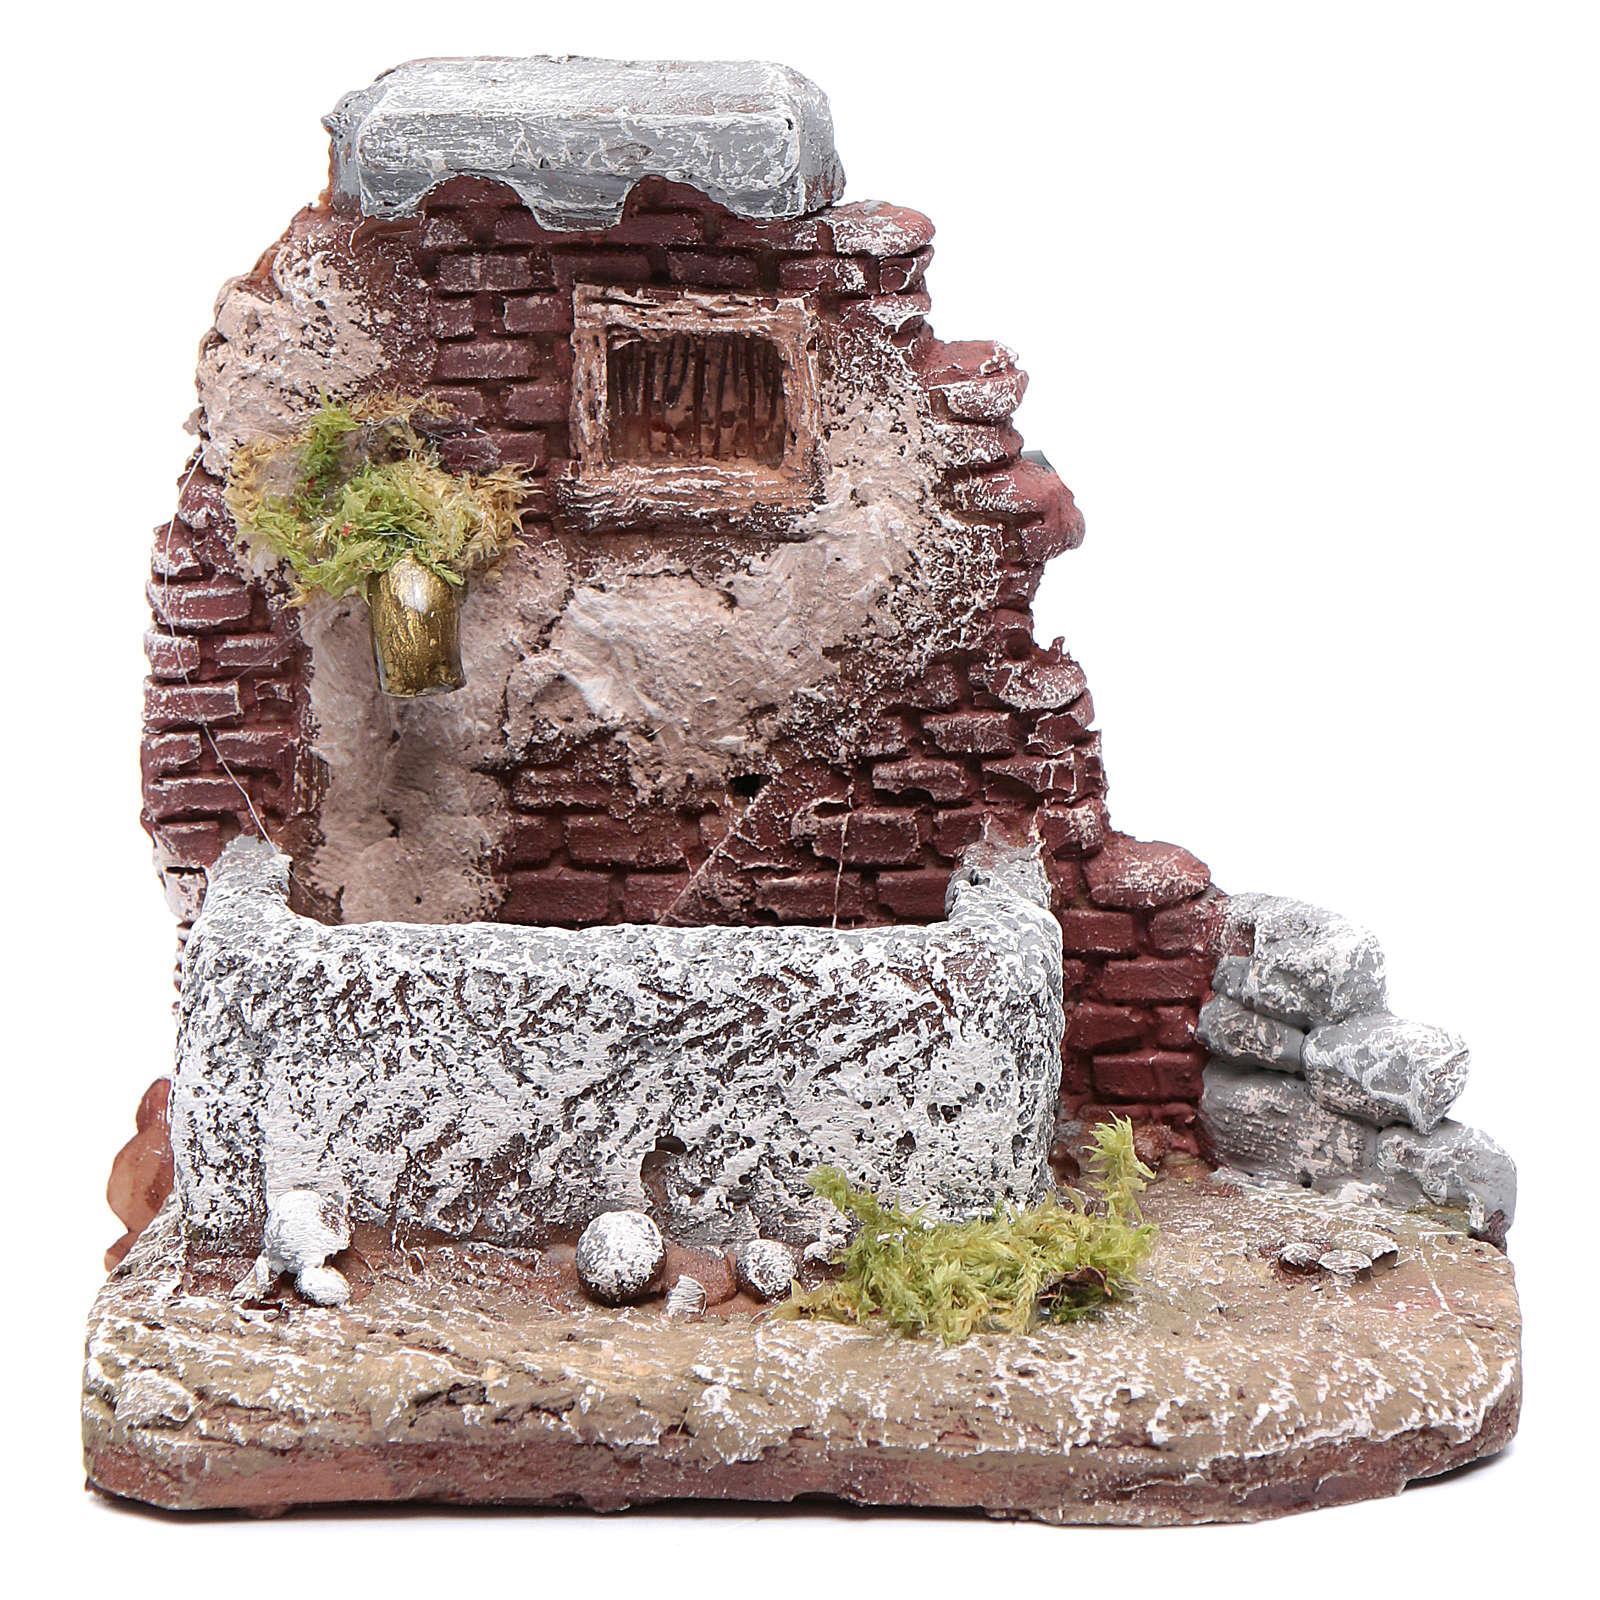 Neapolitan nativity scene fountain in resin 10x10x10 cm with pump 4